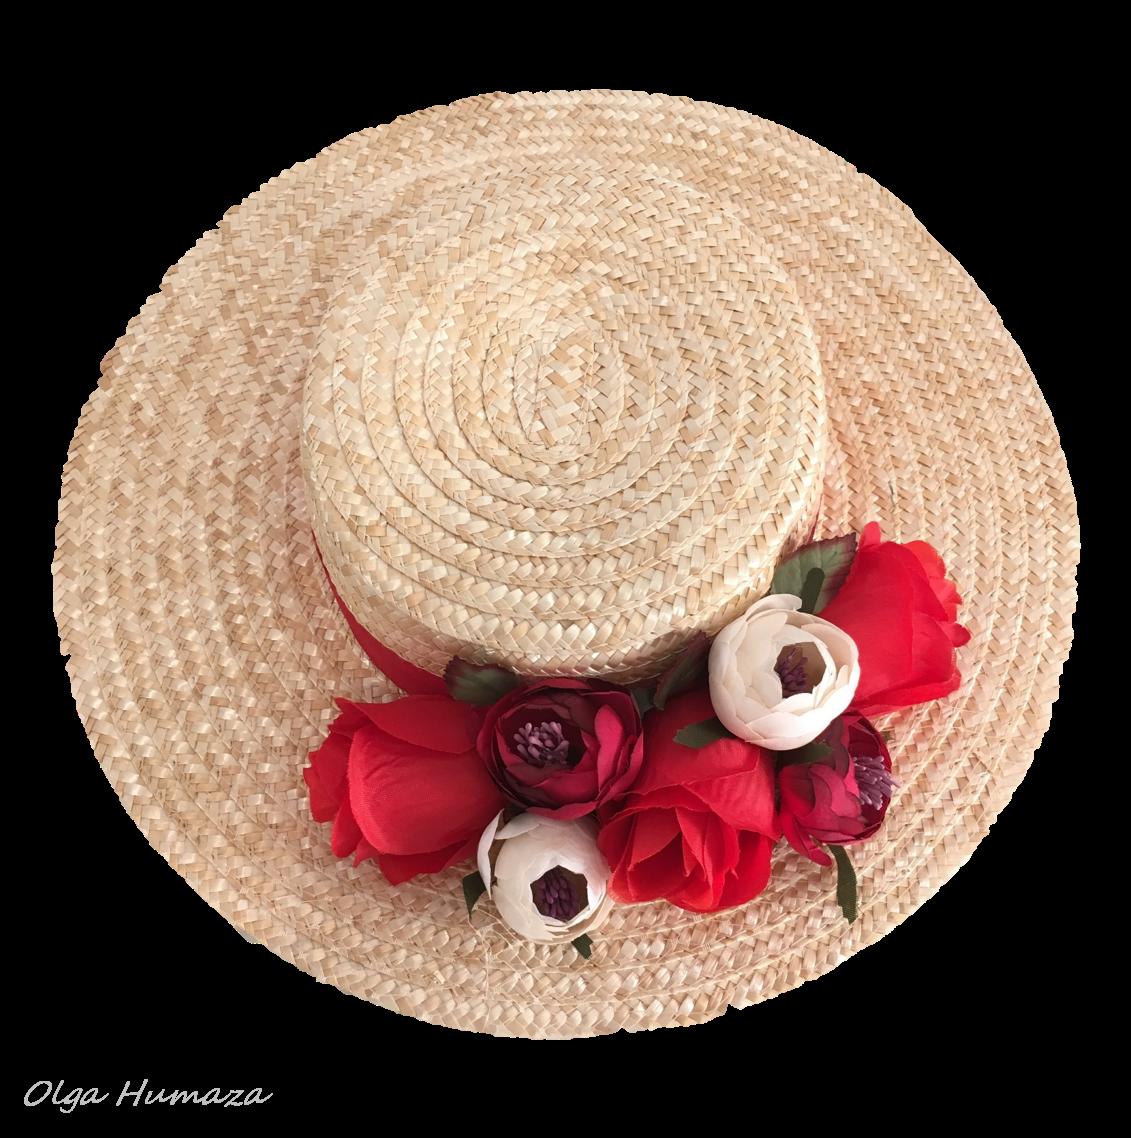 http://olgahumaza.blogspot.com.es/2014/03/b15-tocado-mini-sombrero-canotier-en.html